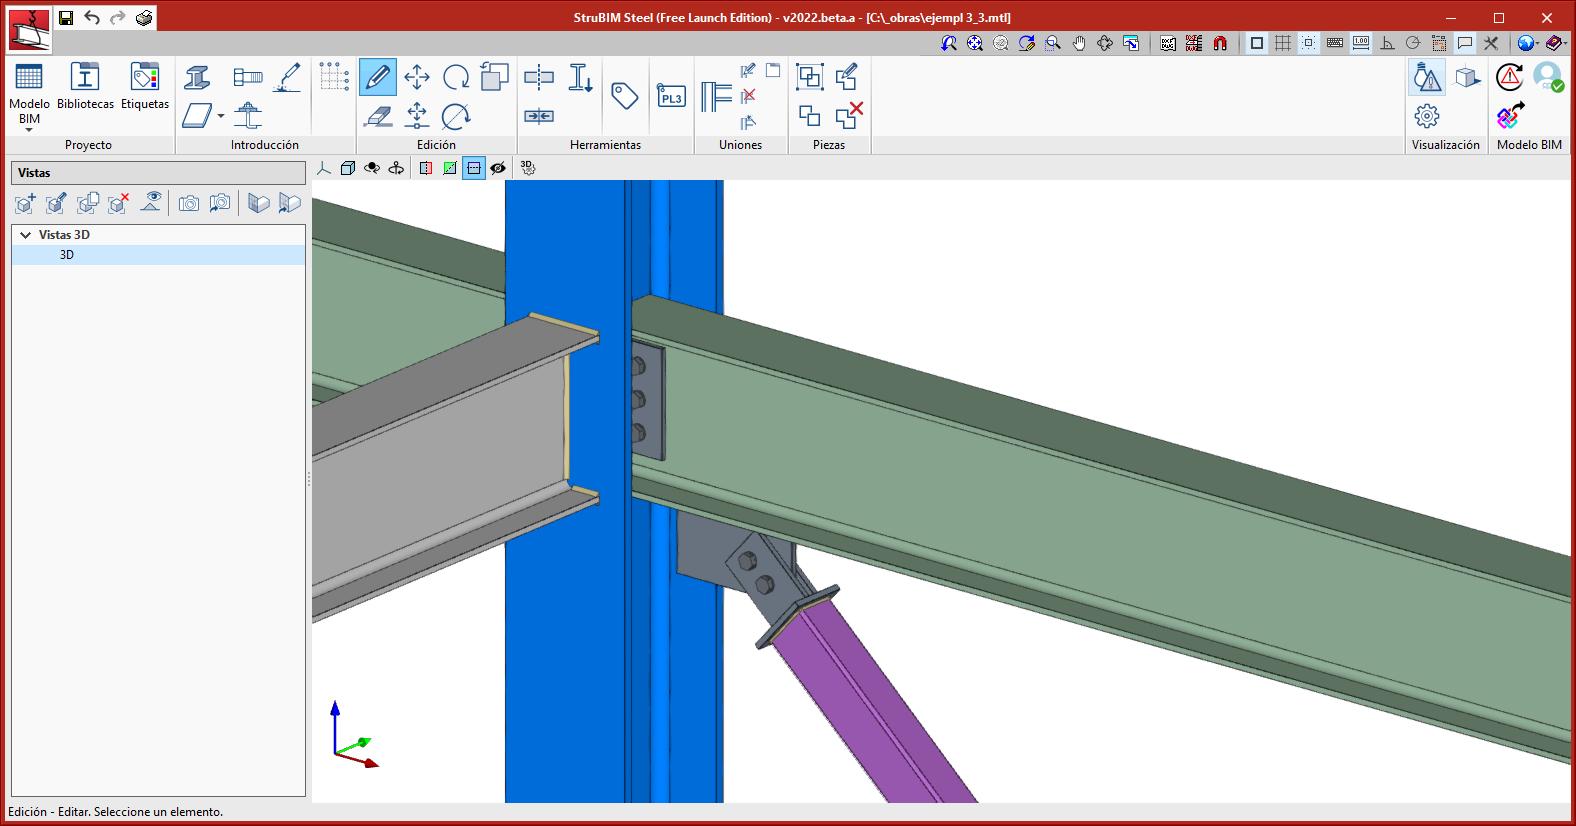 StruBIM Steel. Diagonal unida a perfil principal, con chapa frontal